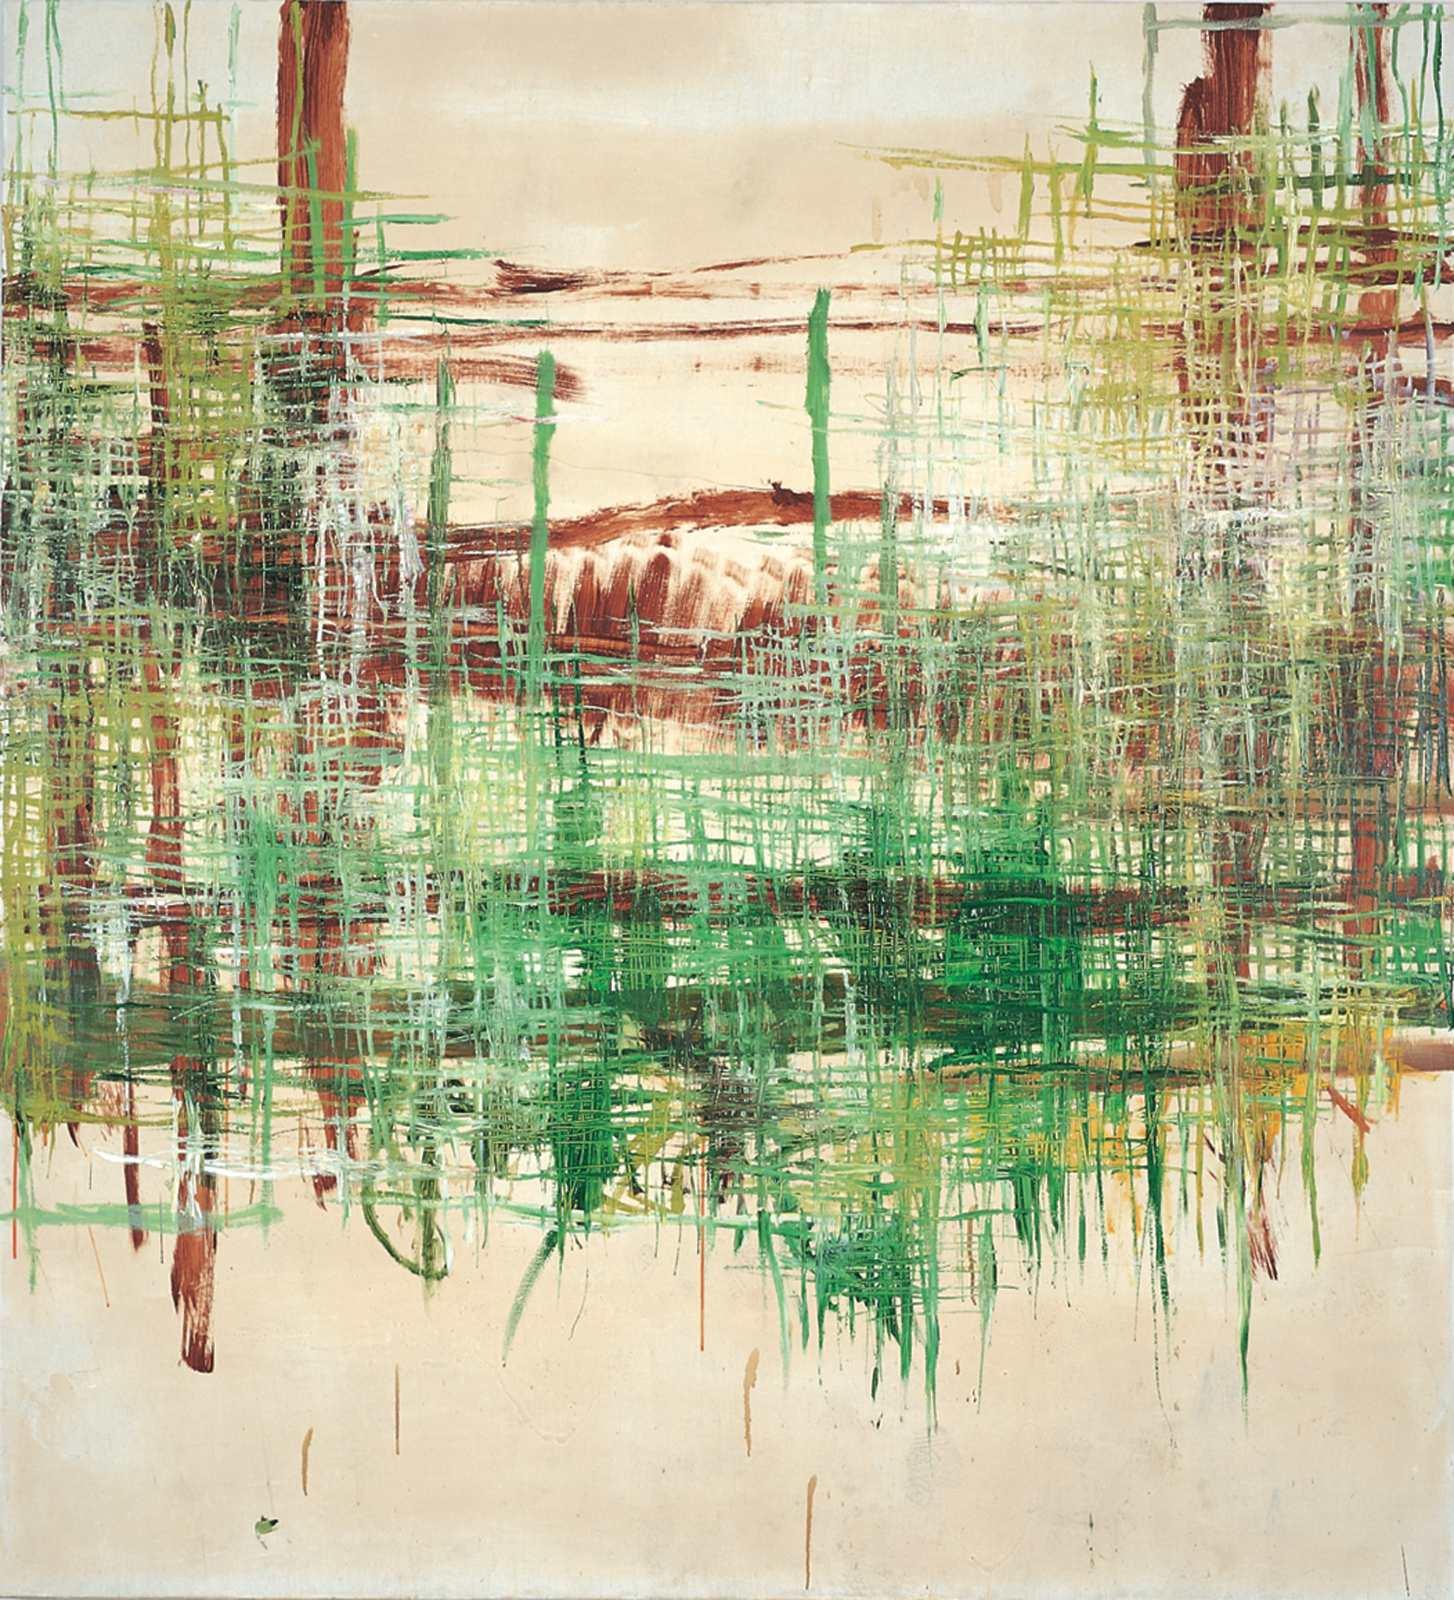 Edition Biographie, 1997, oil on canvas, 220 x 200 cm